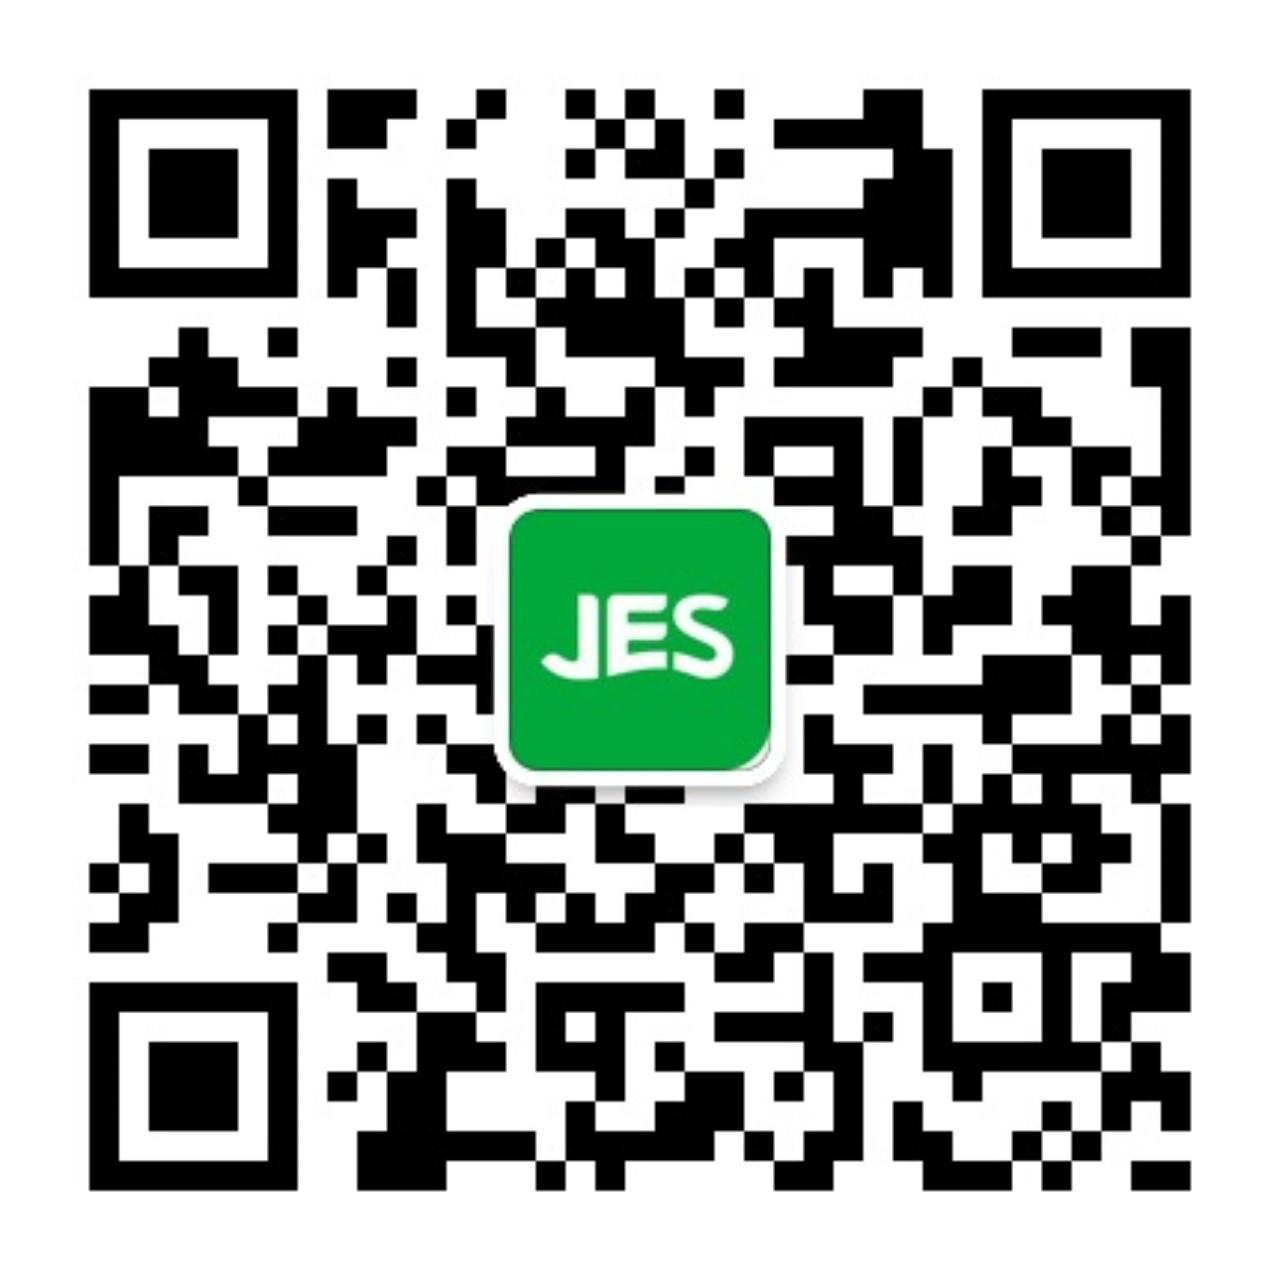 Journal of Environmental Sciences